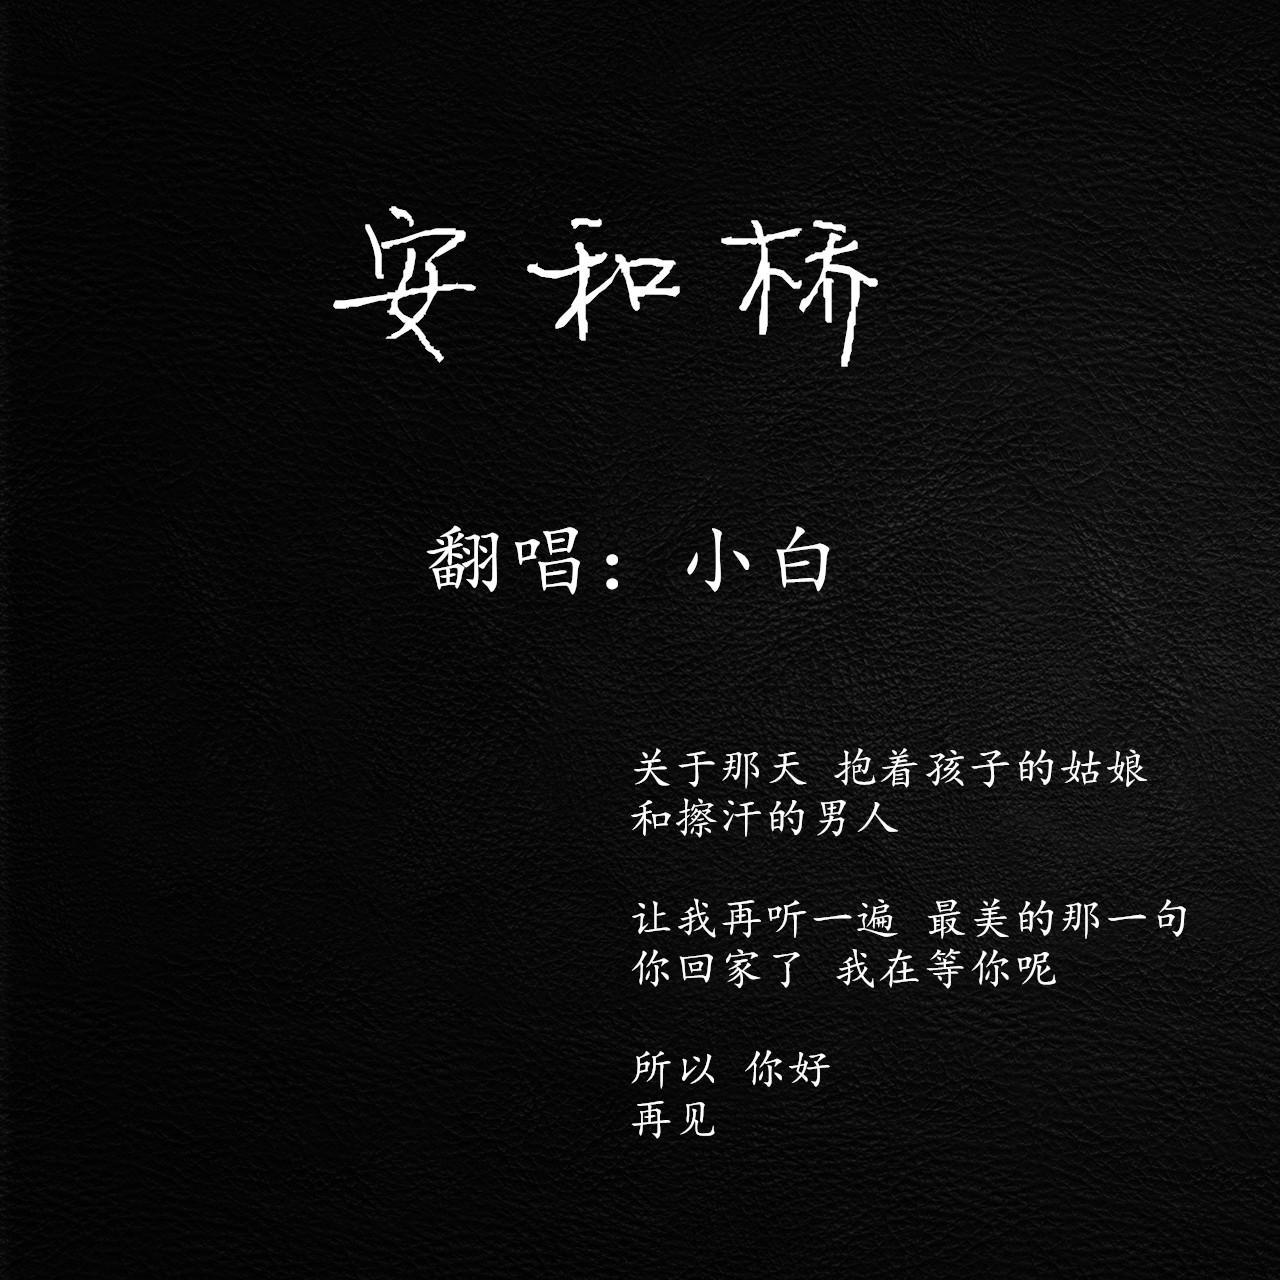 安和桥(cover宋冬野)